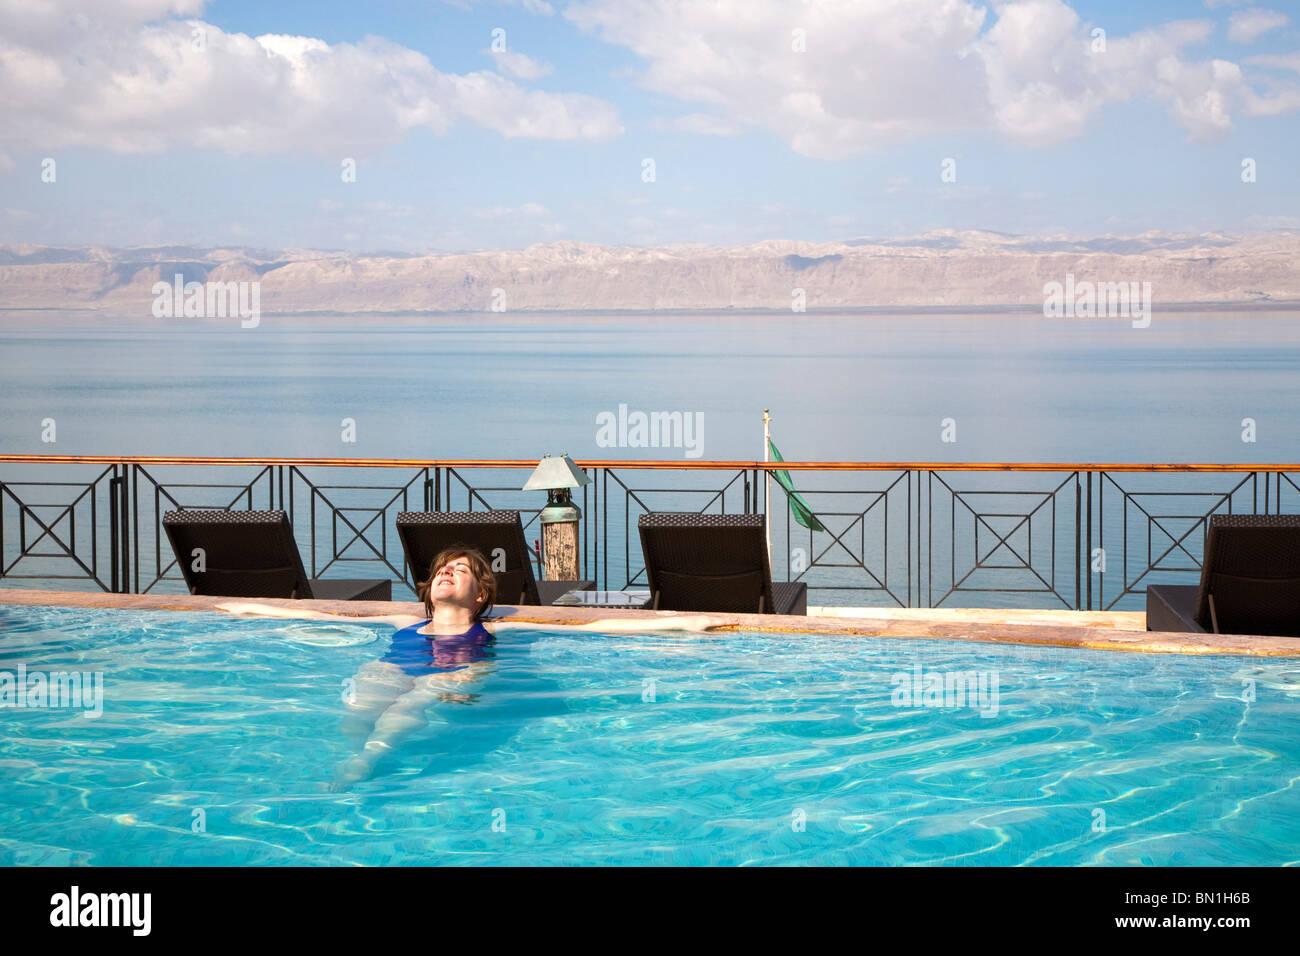 Middle East, Jordan, Dead Sea, 400 metres below sea level - Stock Image